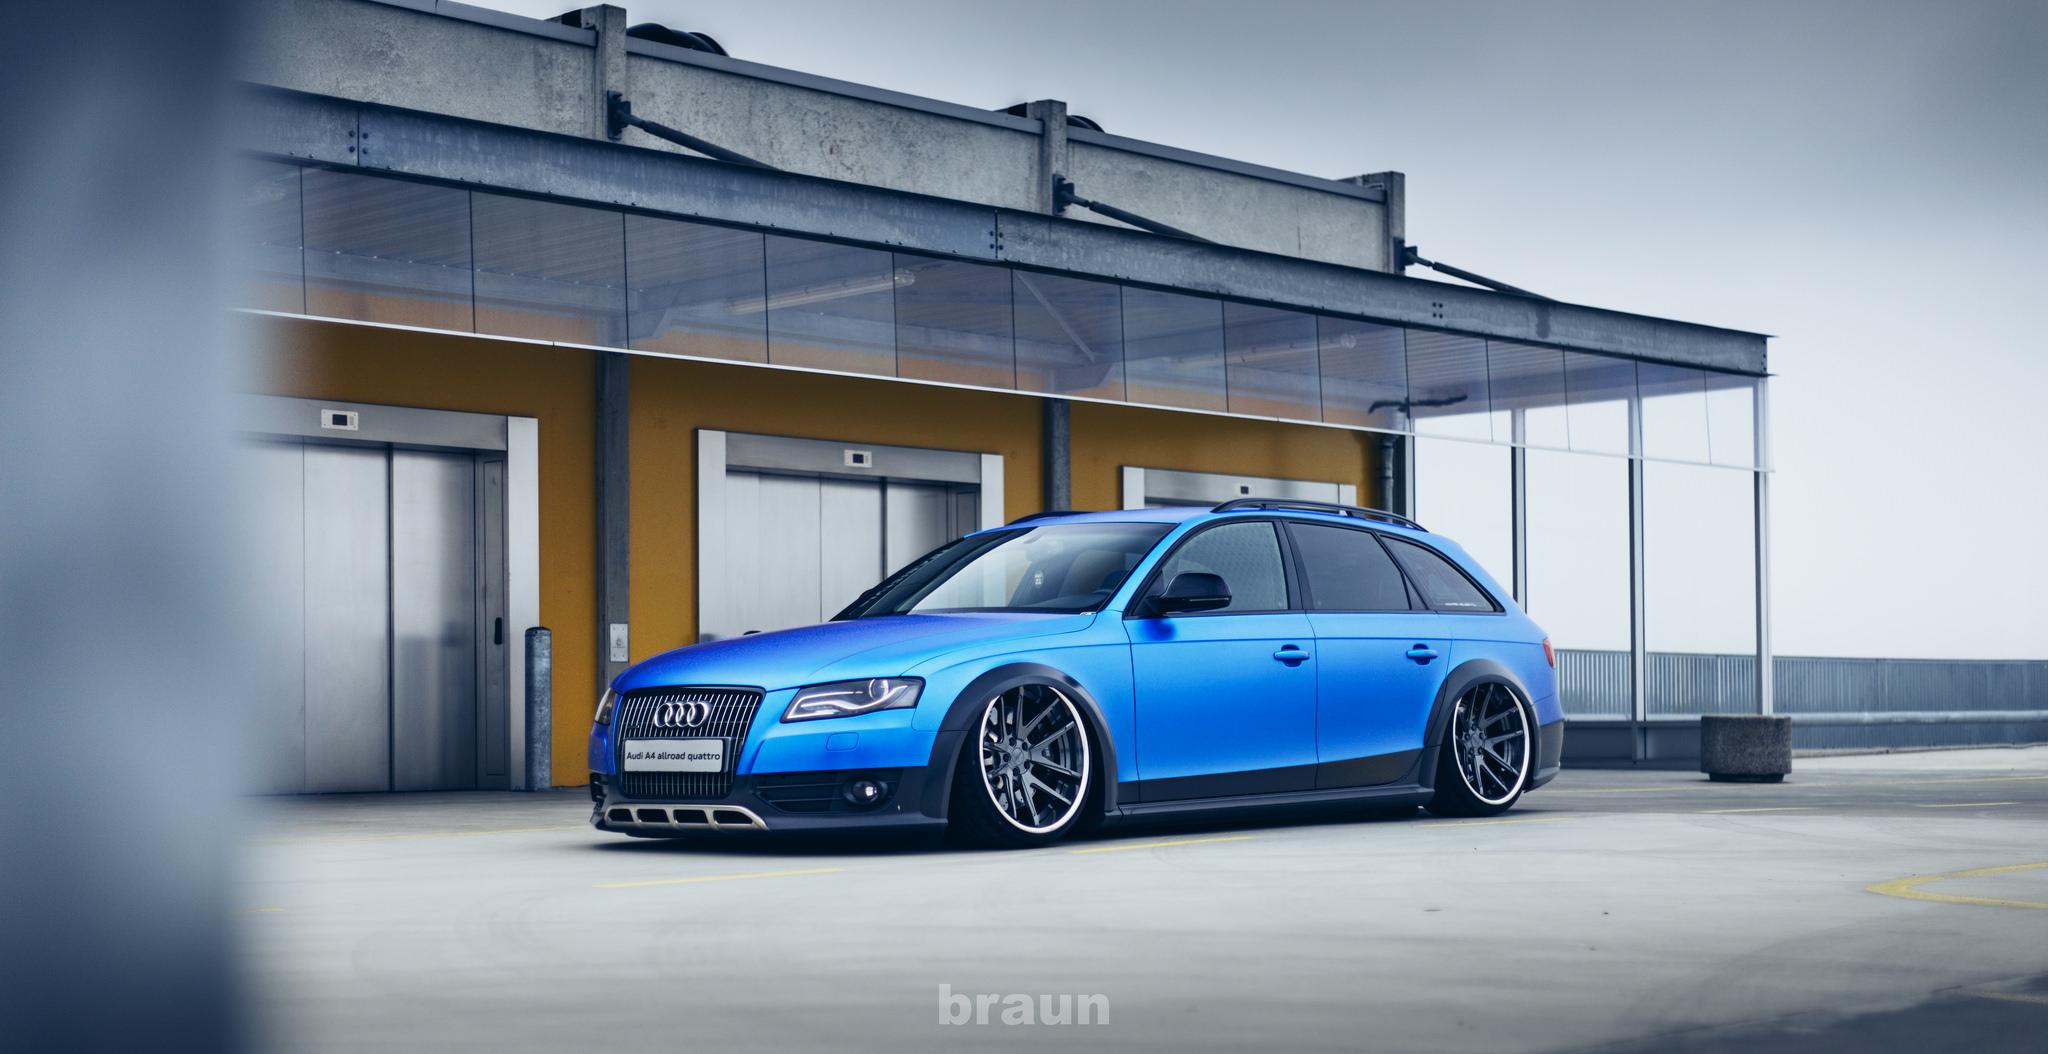 UroTuning  VW  Audi  BMW  MINI OEM amp Performance Parts